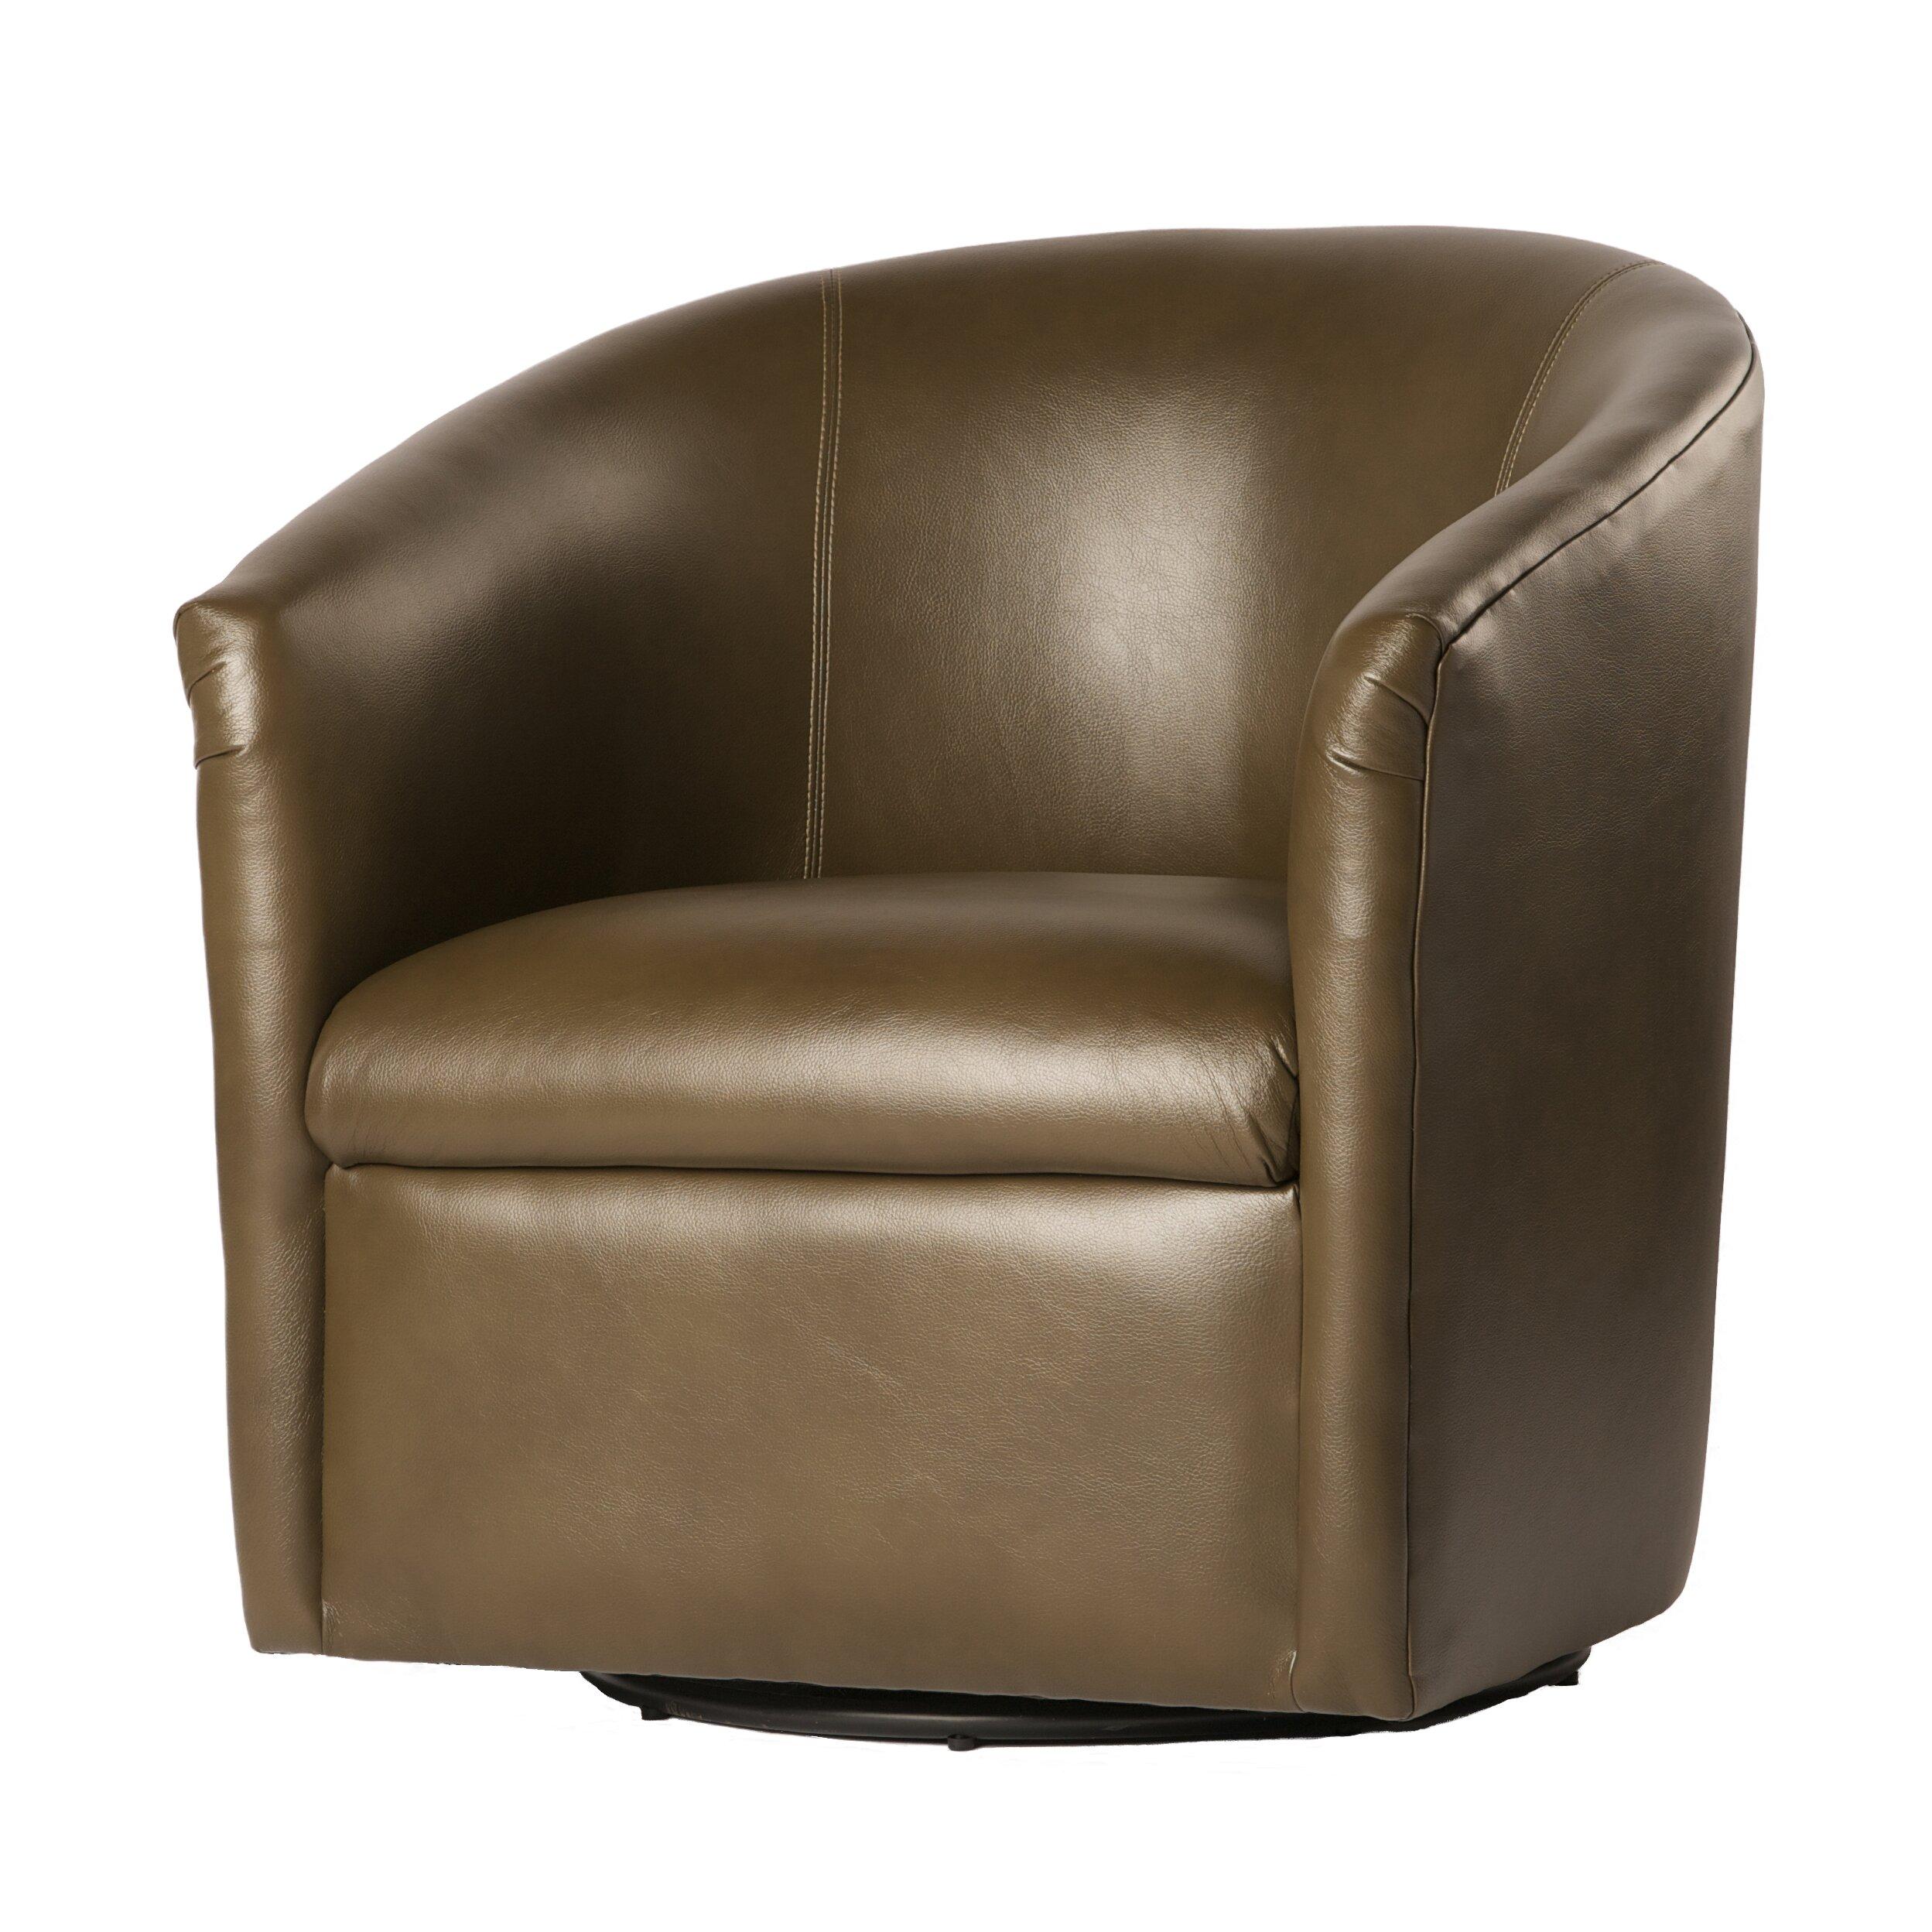 Comfort Pointe Draper Swivel Barrel Chair Amp Reviews Wayfair